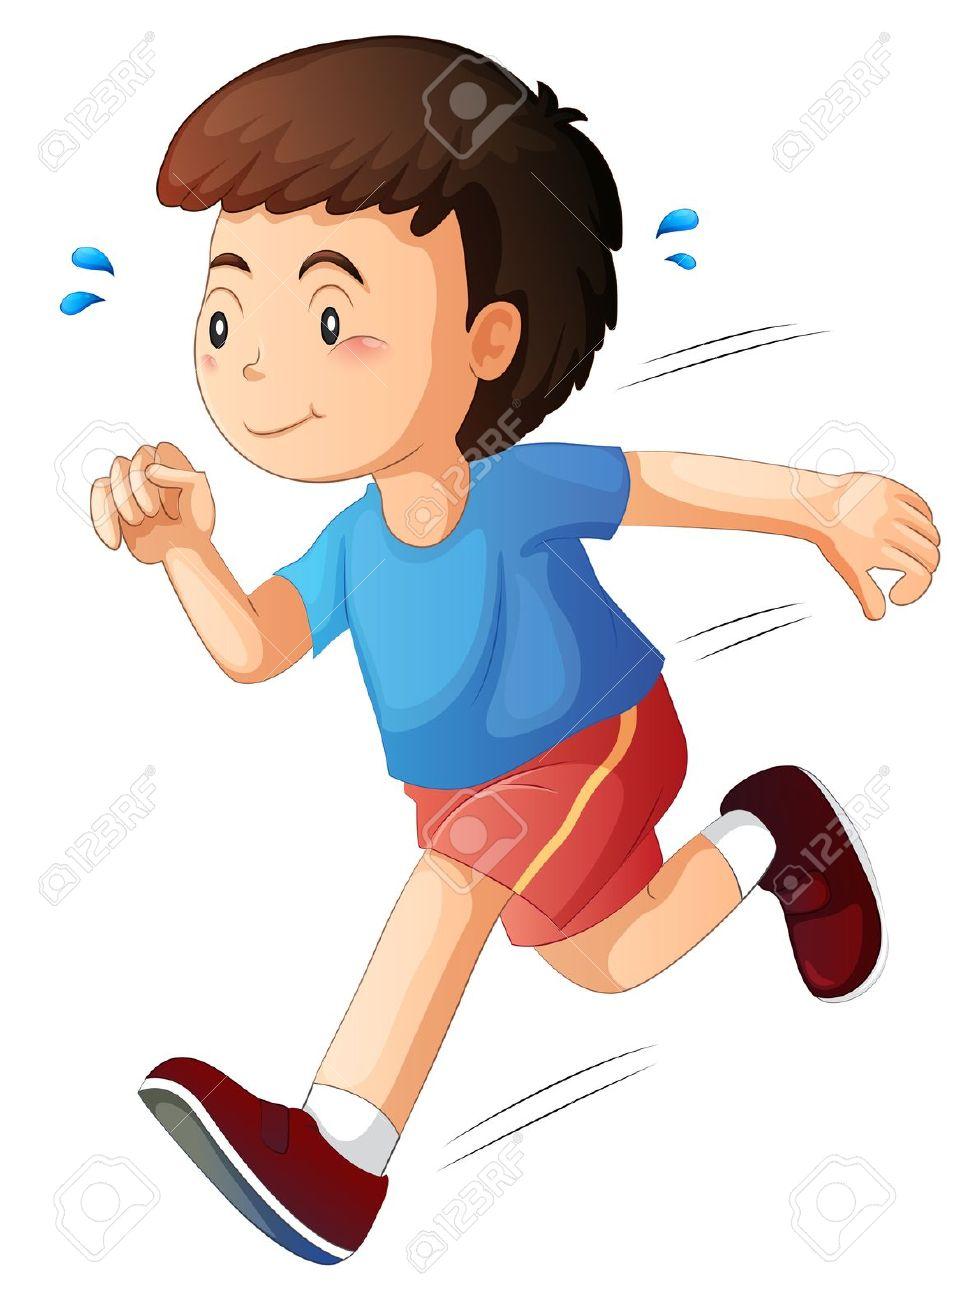 Boy run clipart svg library library 13+ Boy Running Clipart | ClipartLook svg library library